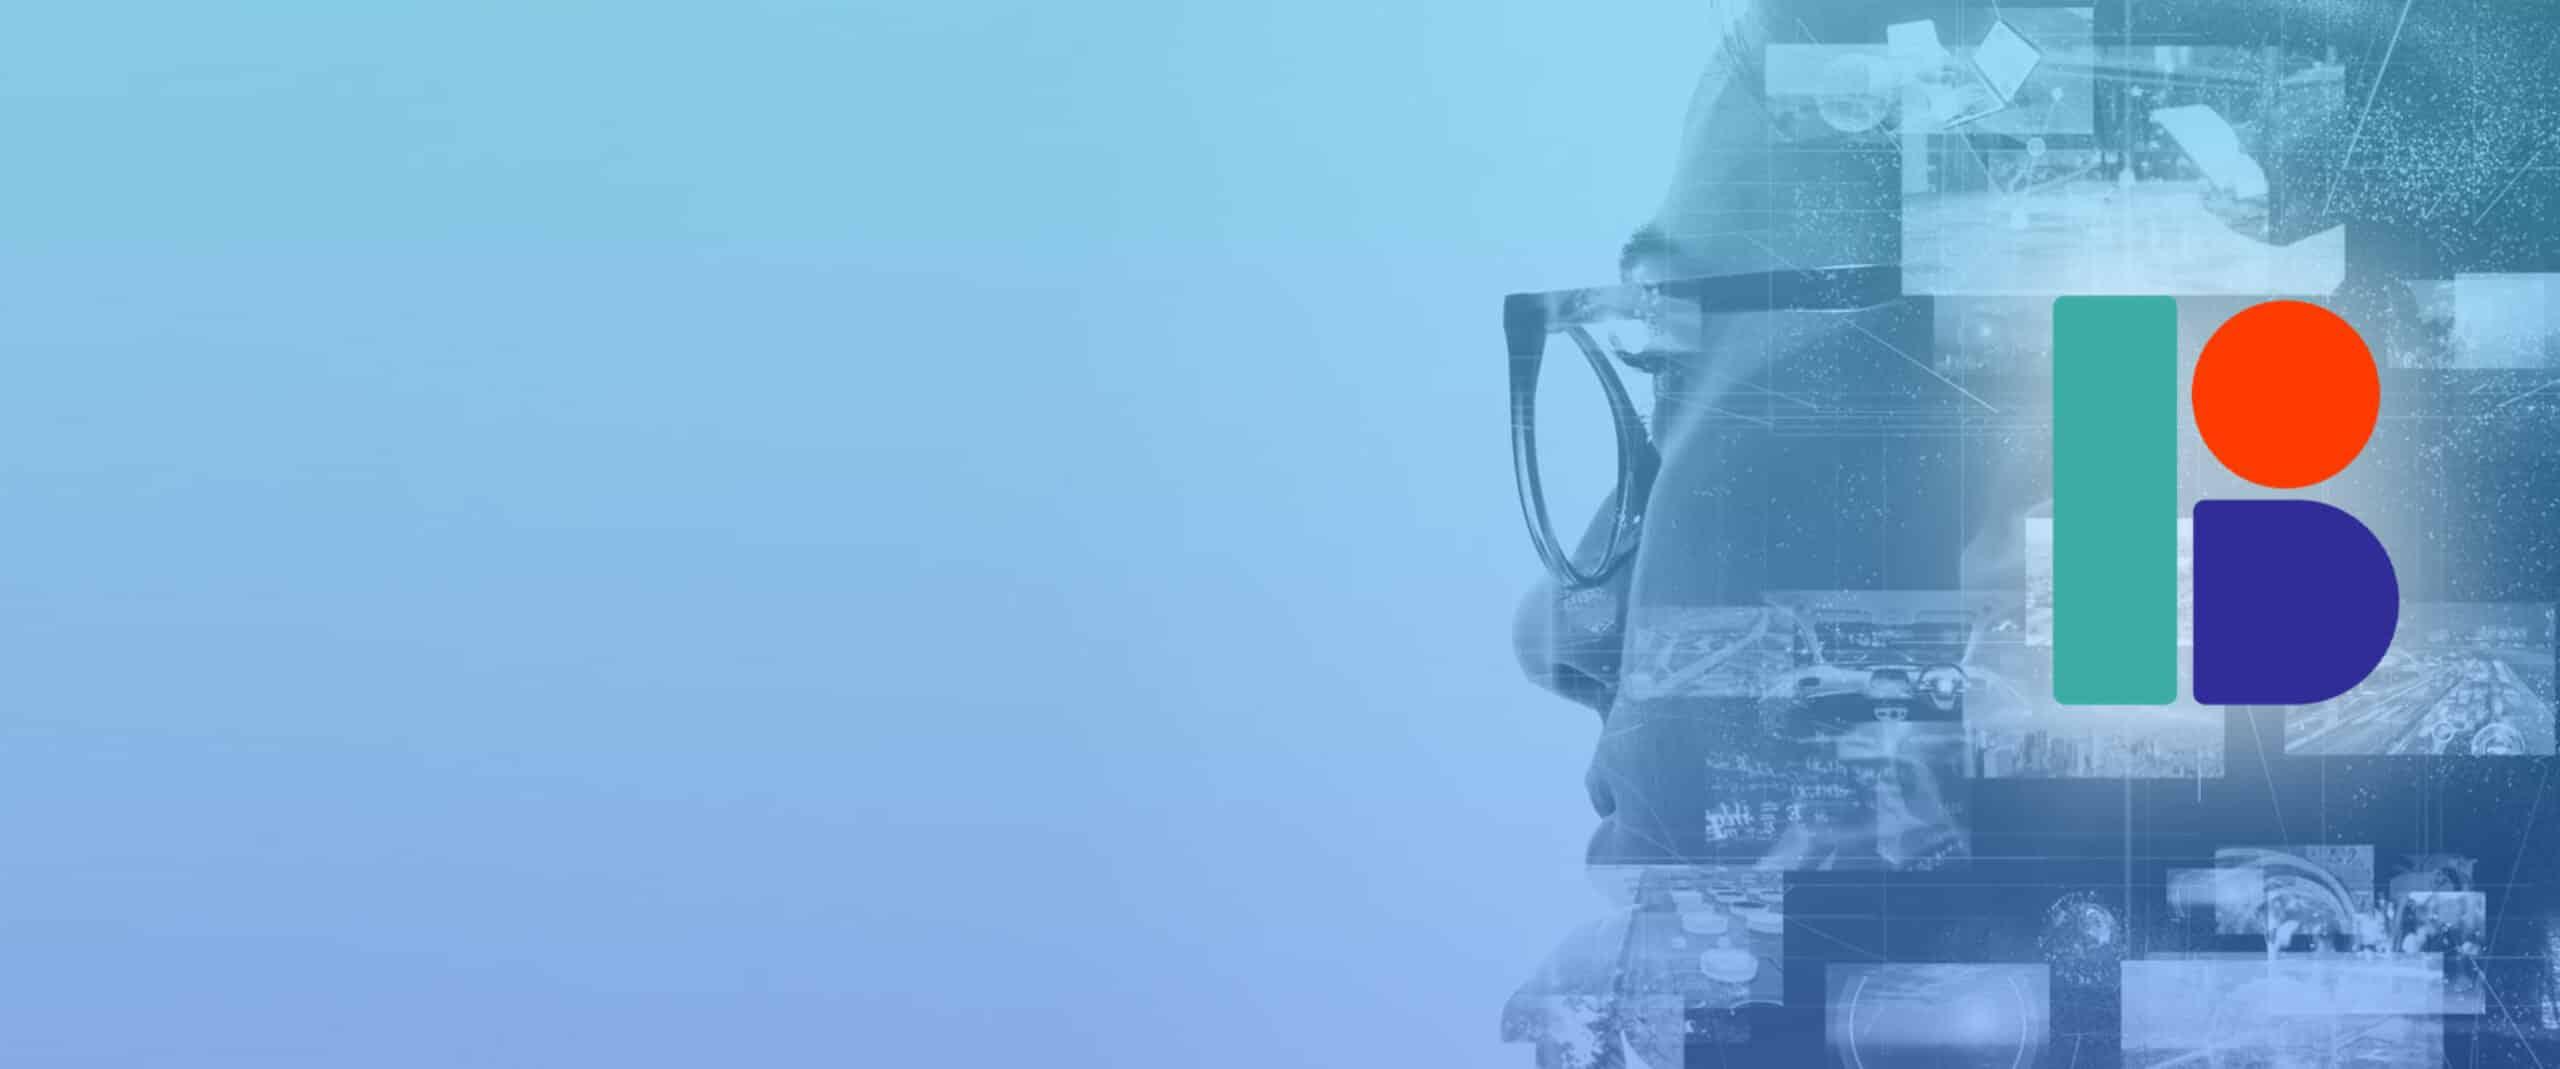 Prodware Innovation Bubble header